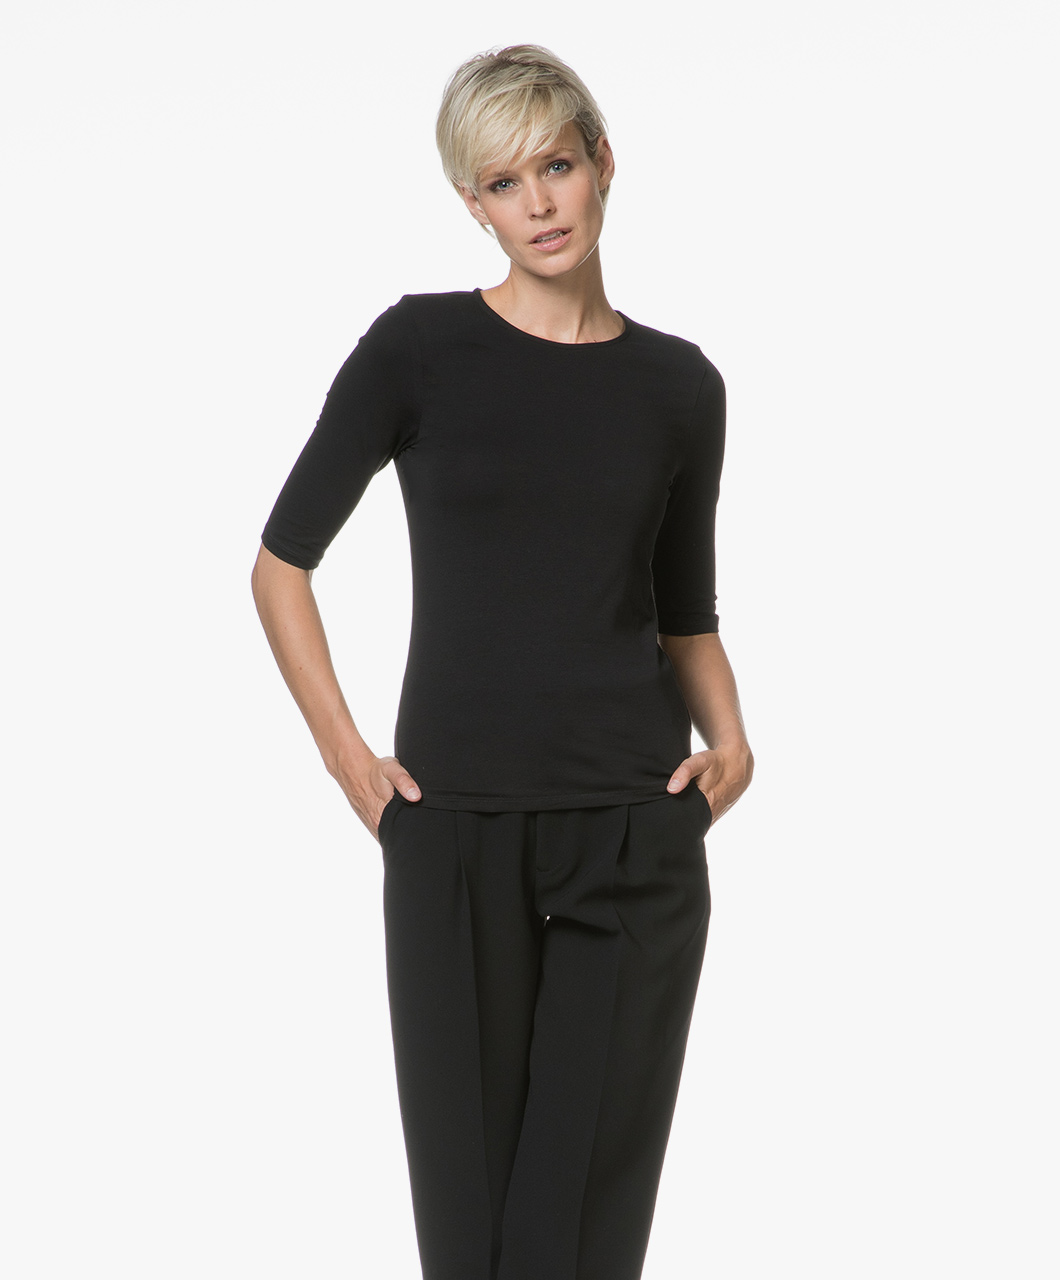 Filippa K Cotton Stretch Elbow Sleeve T shirt Zwart